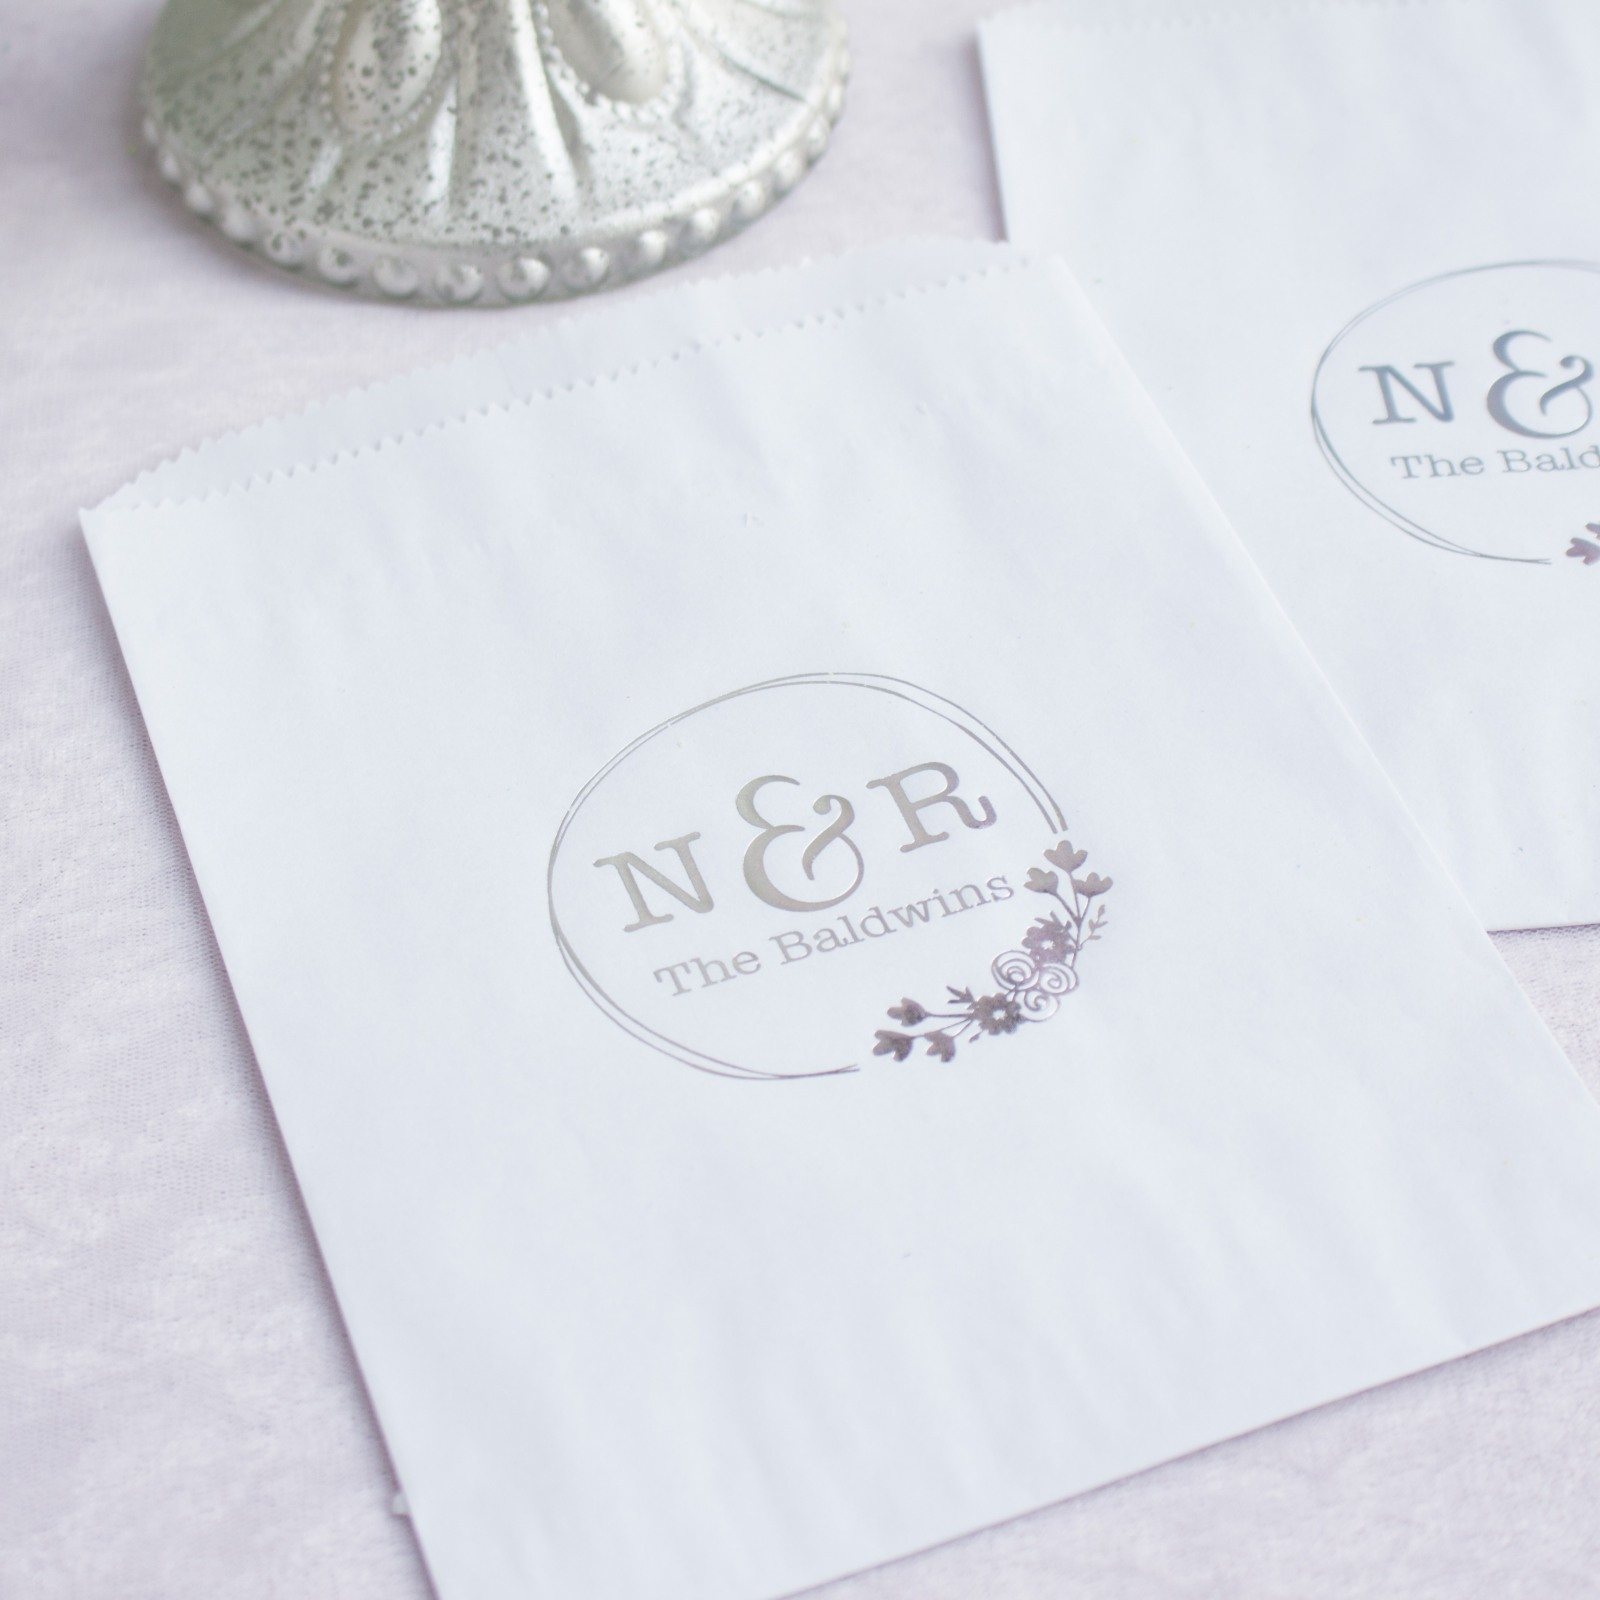 Personalized Botanical Monogram Sweets 'n Treats Bag